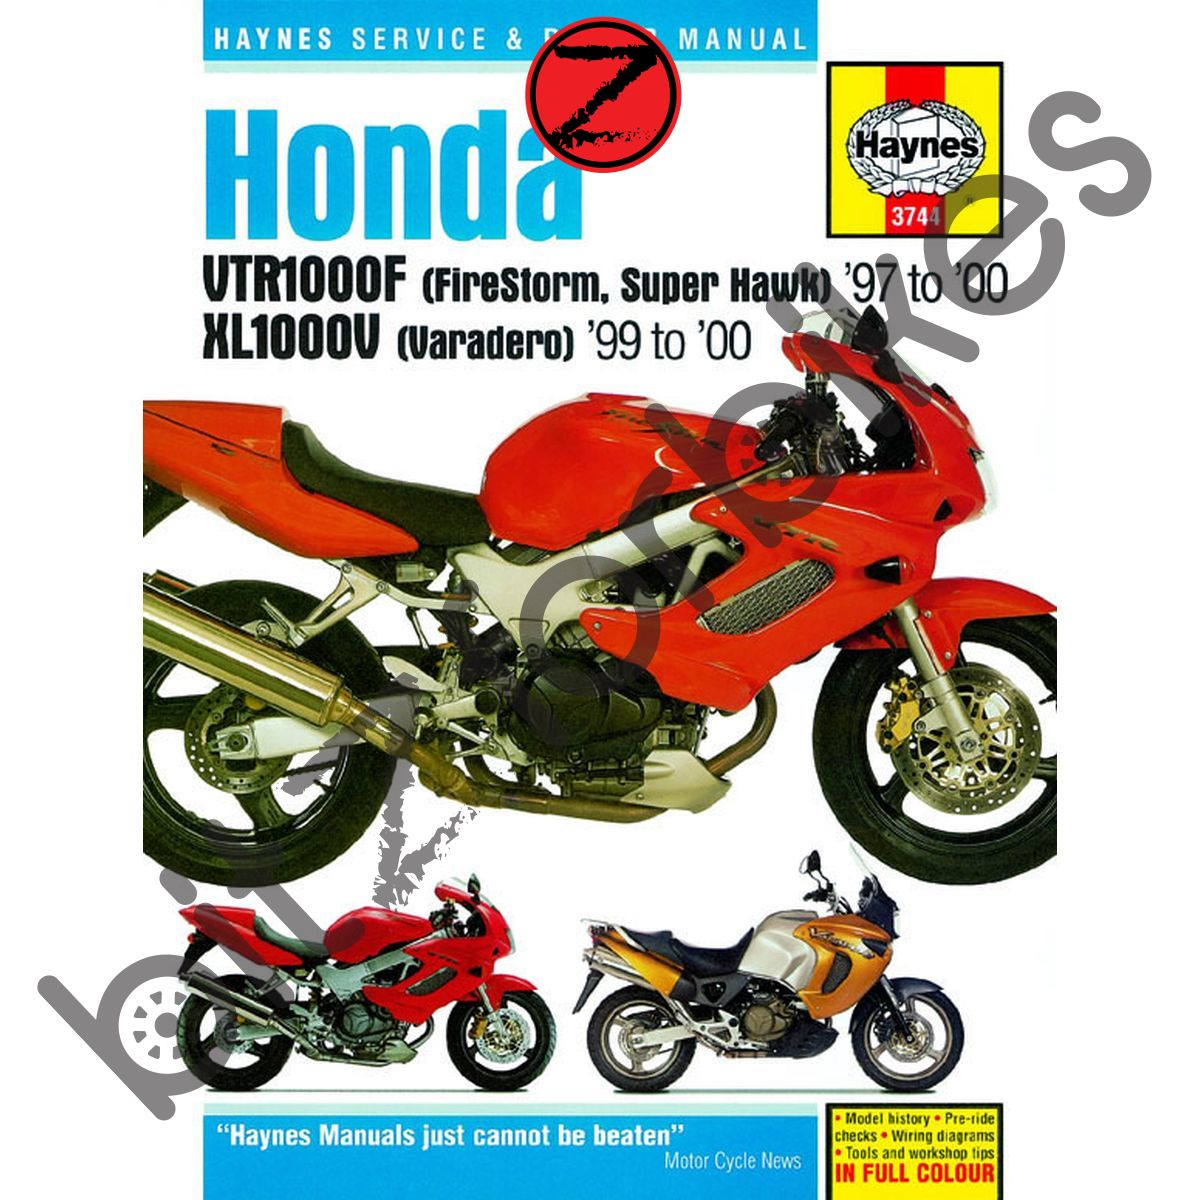 Honda Vtr 1000 Firestorm Wiring Diagram - Wiring Diagram